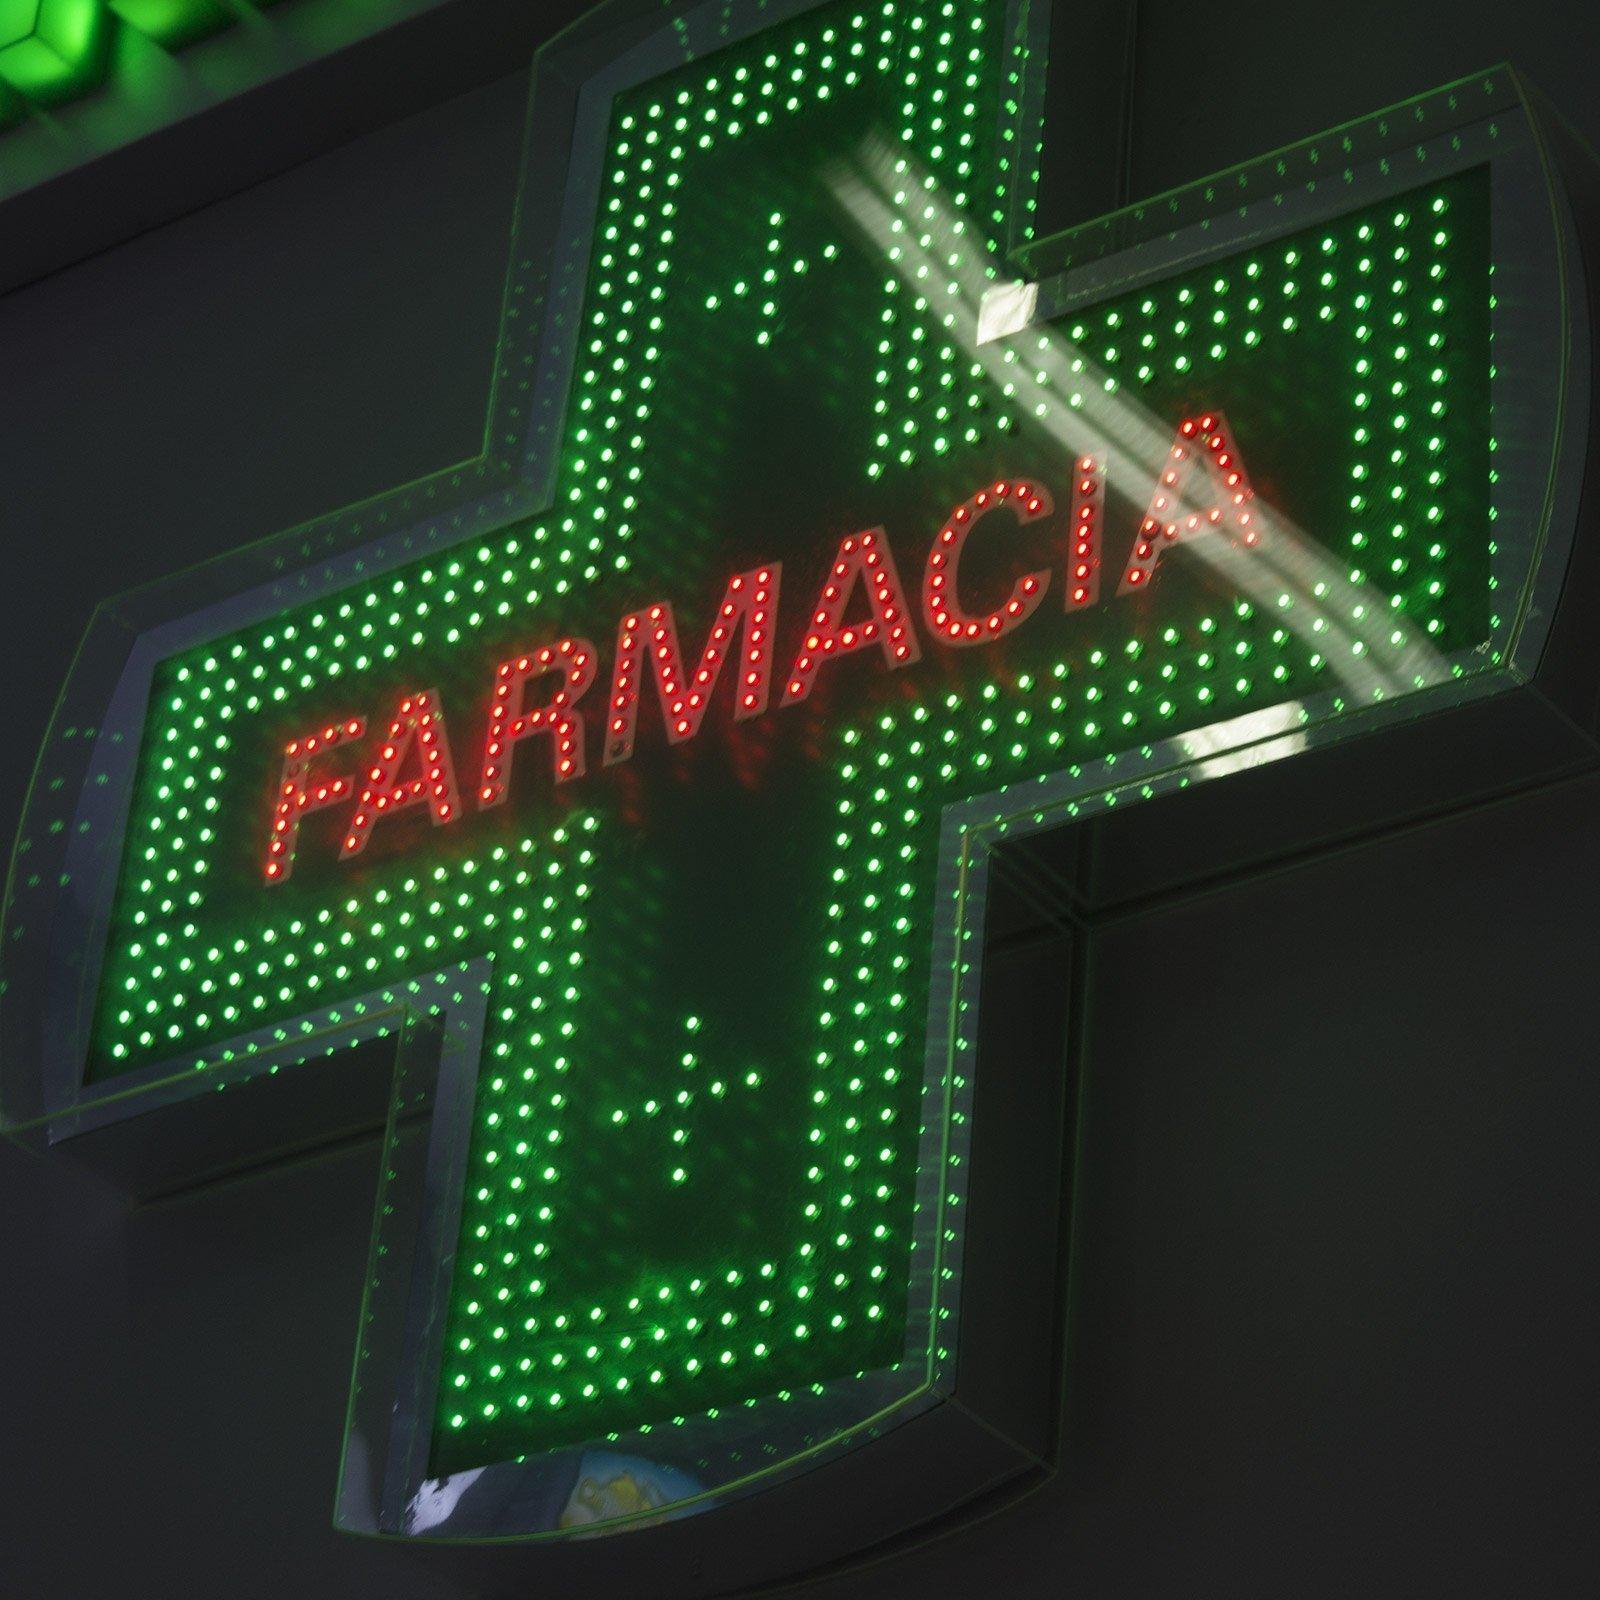 Croce farmacia - insegne a led